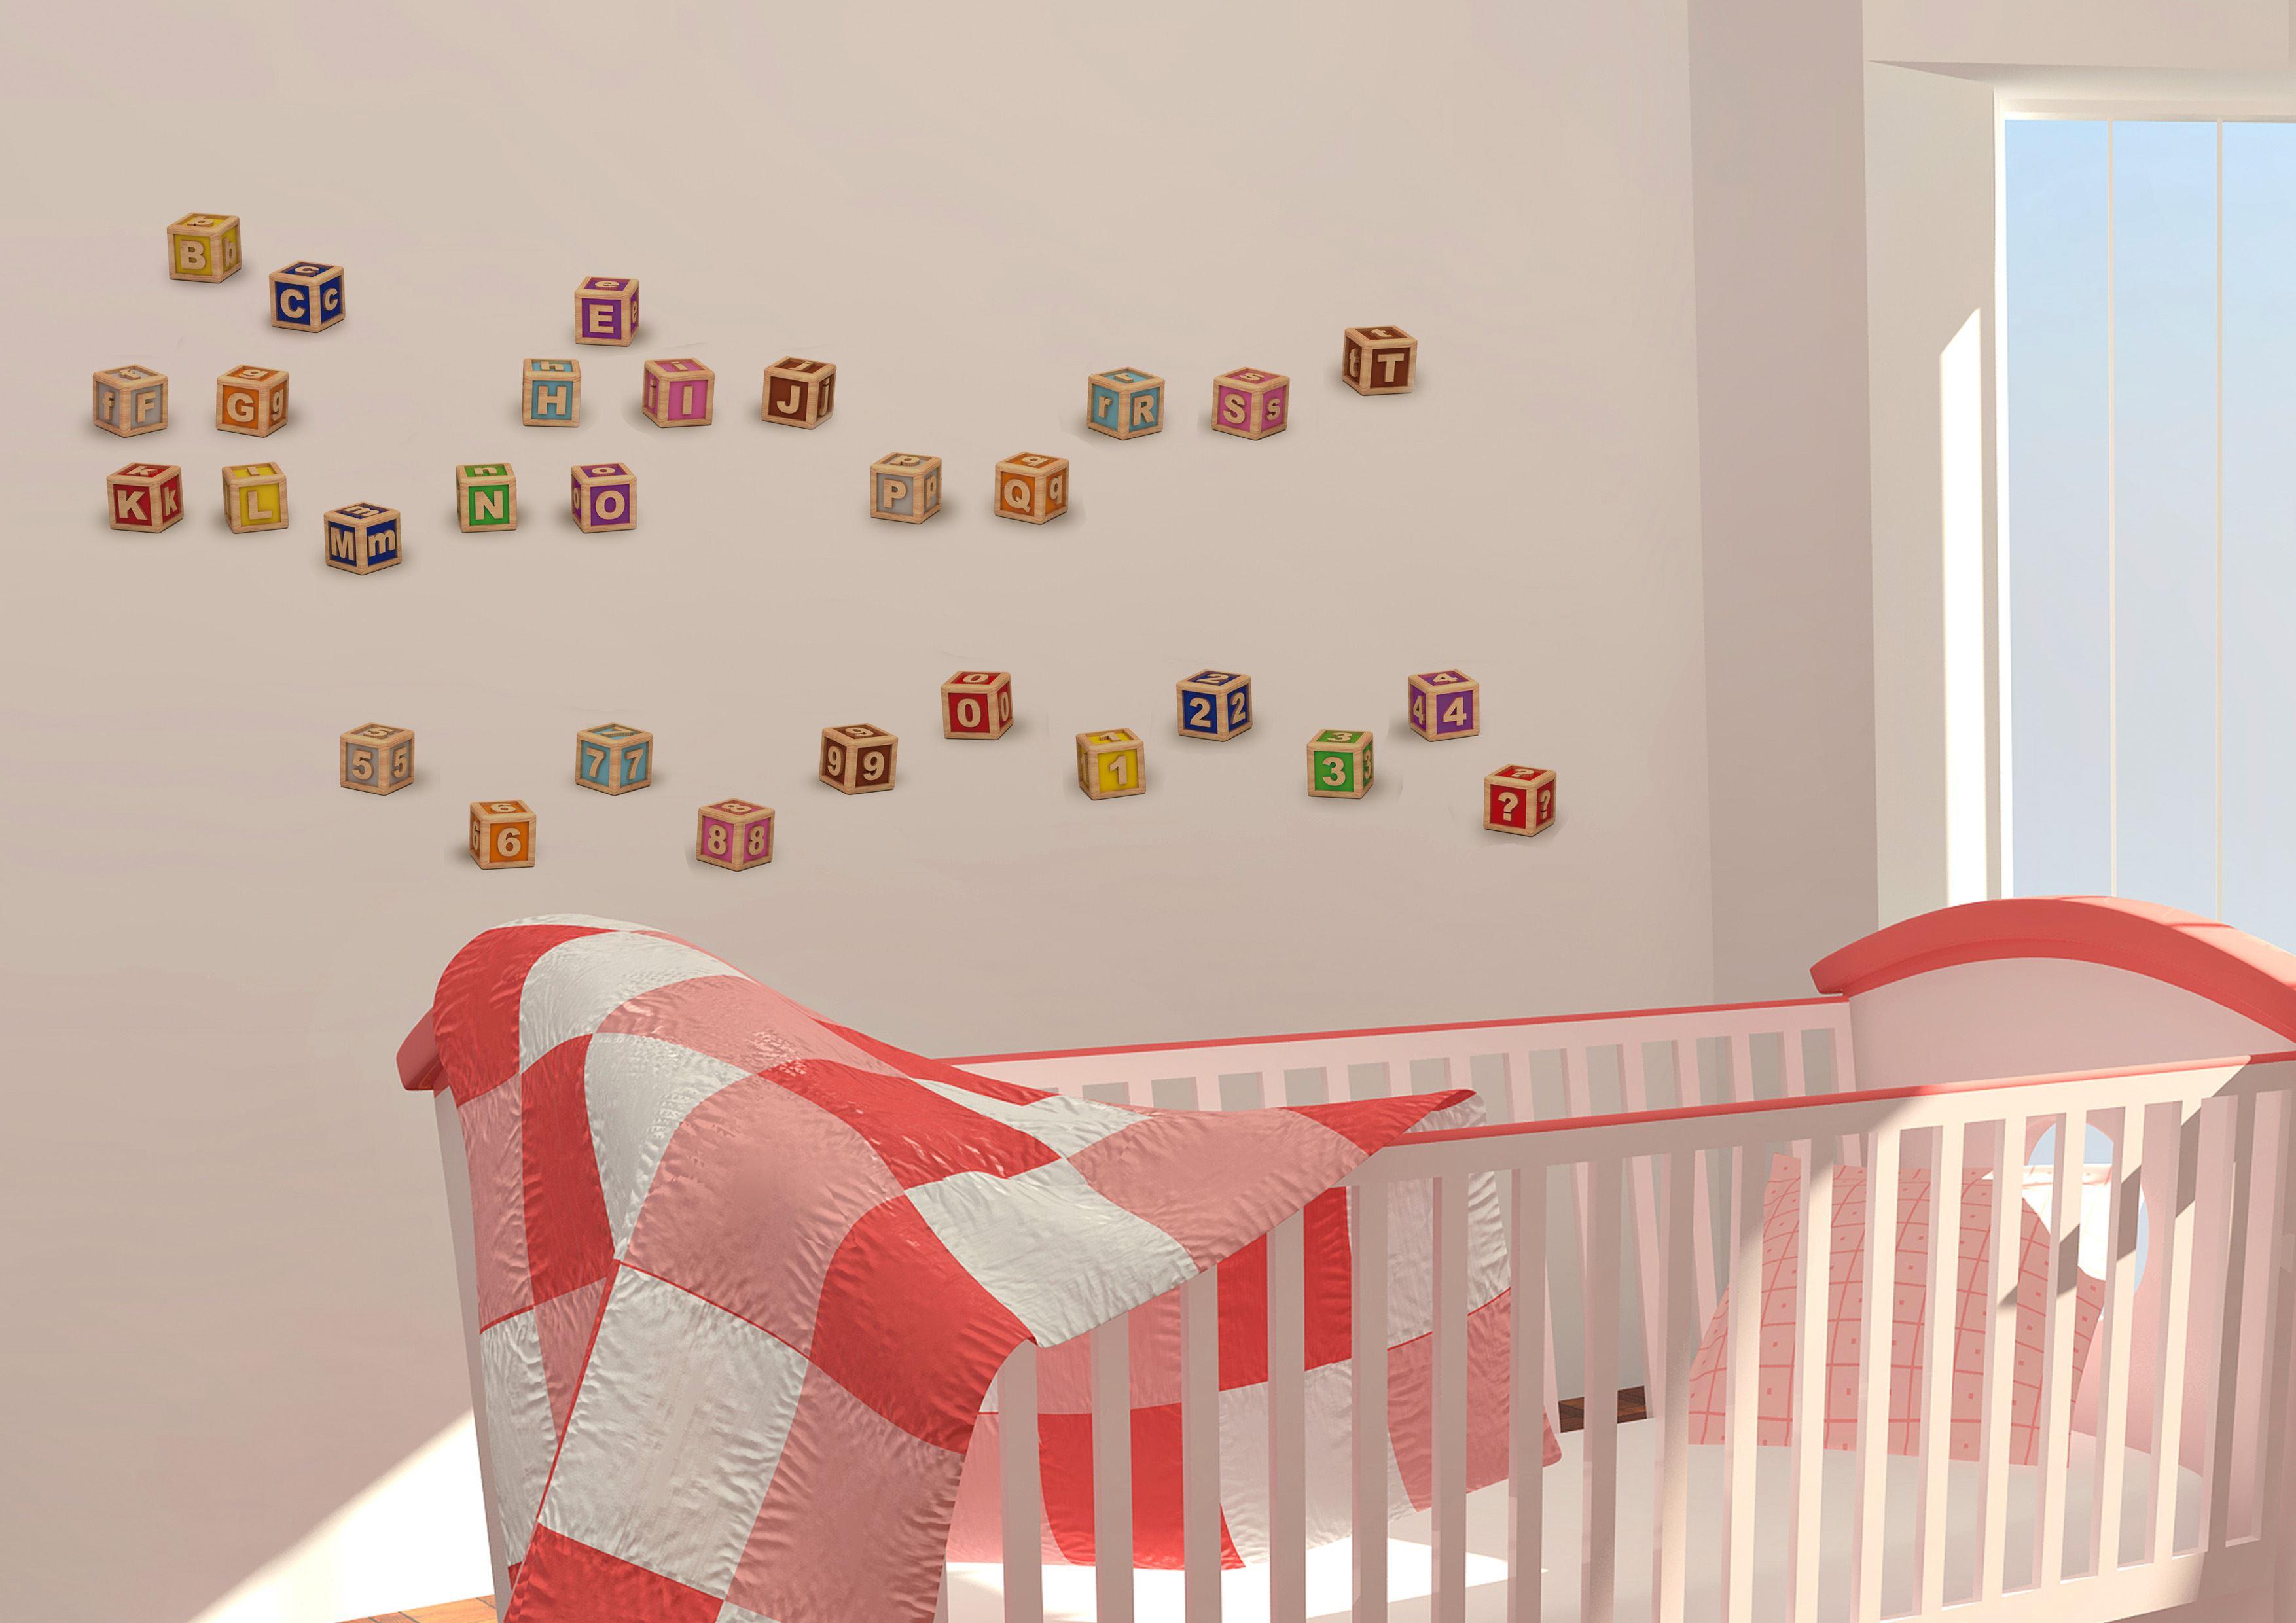 dali buchstaben wandsticker wallstickers. Black Bedroom Furniture Sets. Home Design Ideas